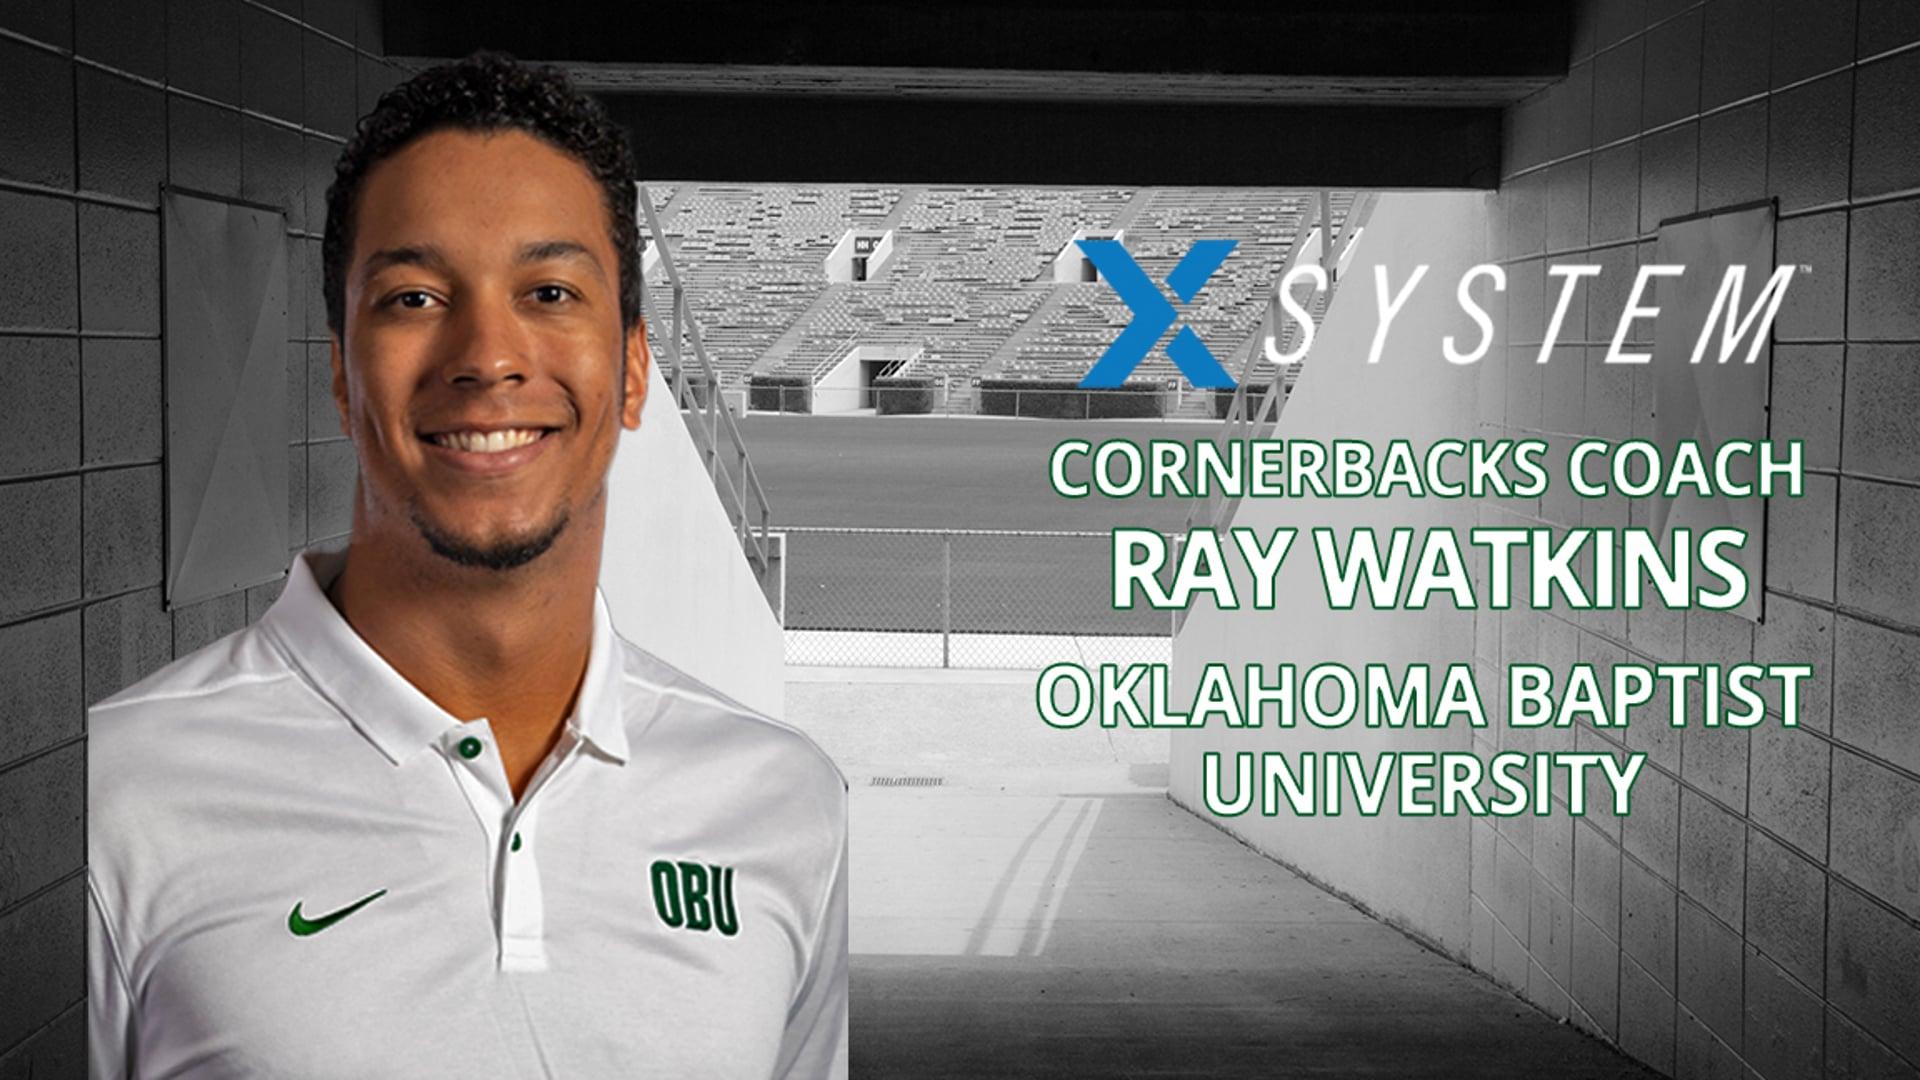 X-System: Ray Watkins, Oklahoma Baptist University